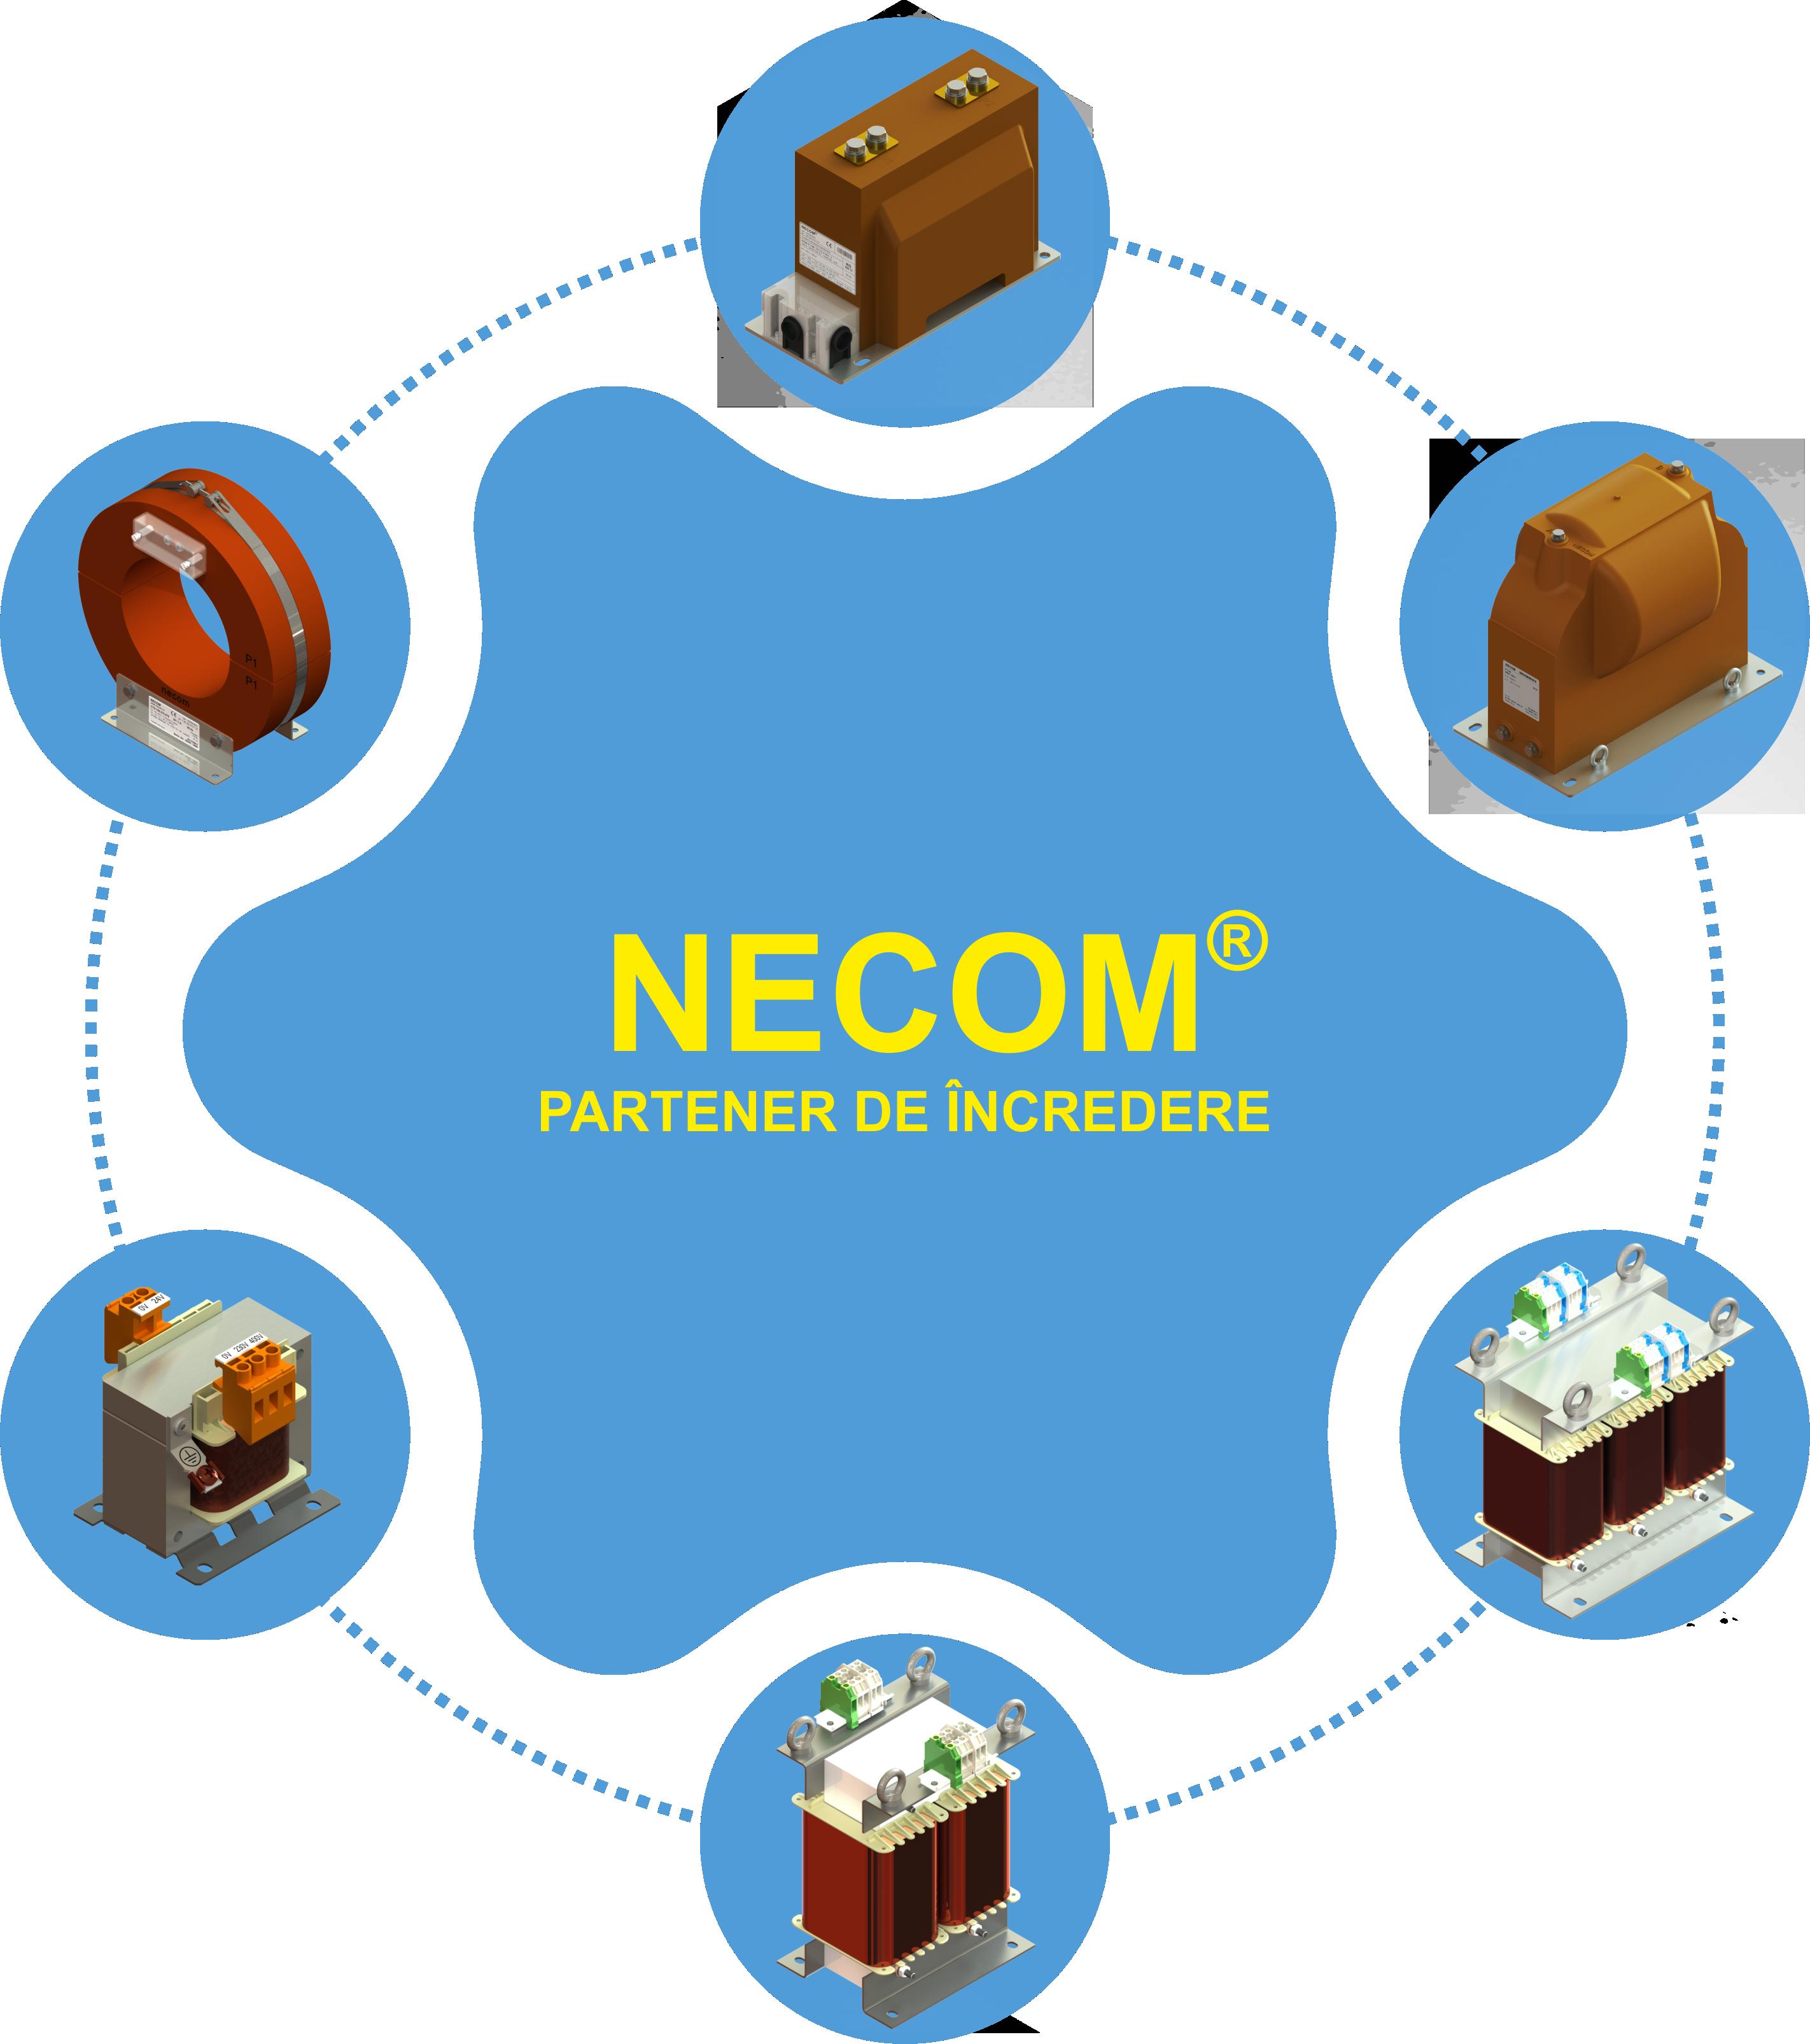 Necom Products